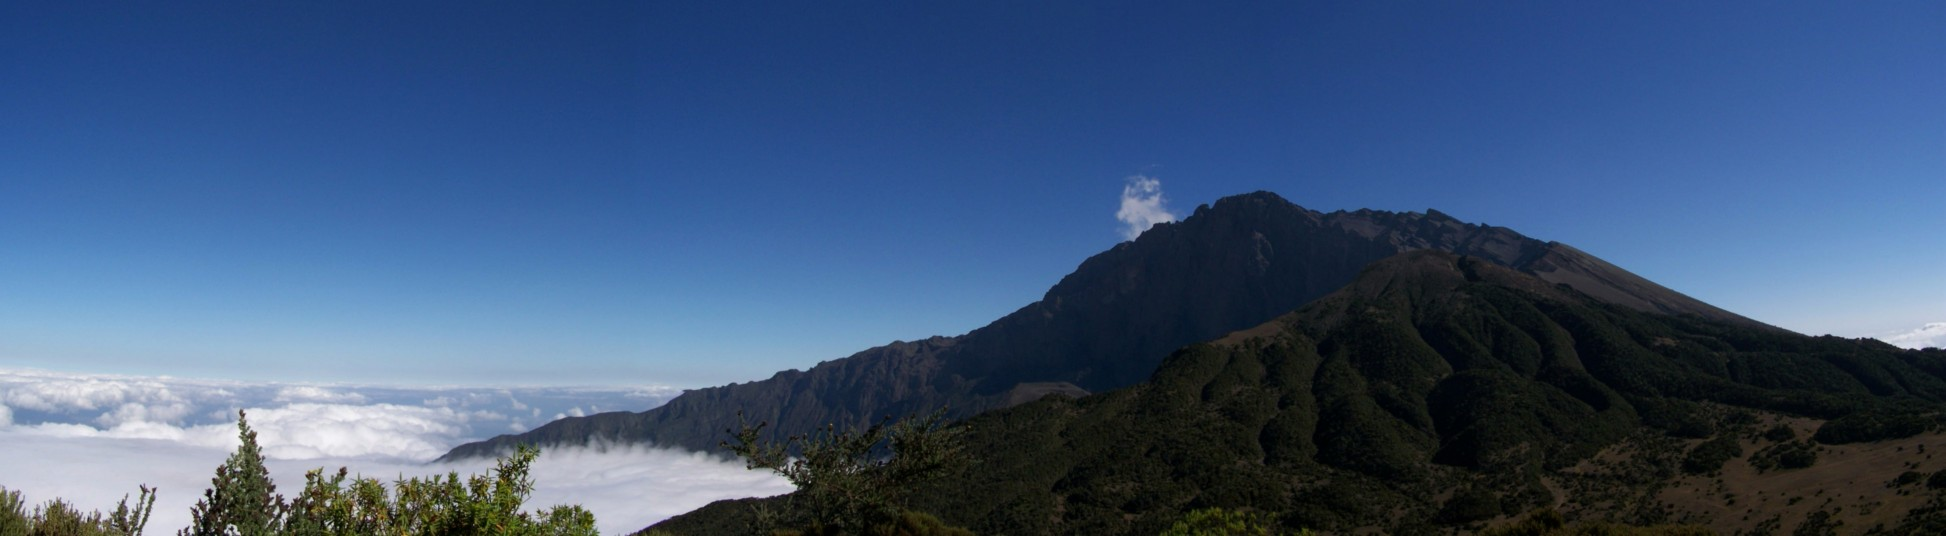 Der Gipfel-panorama